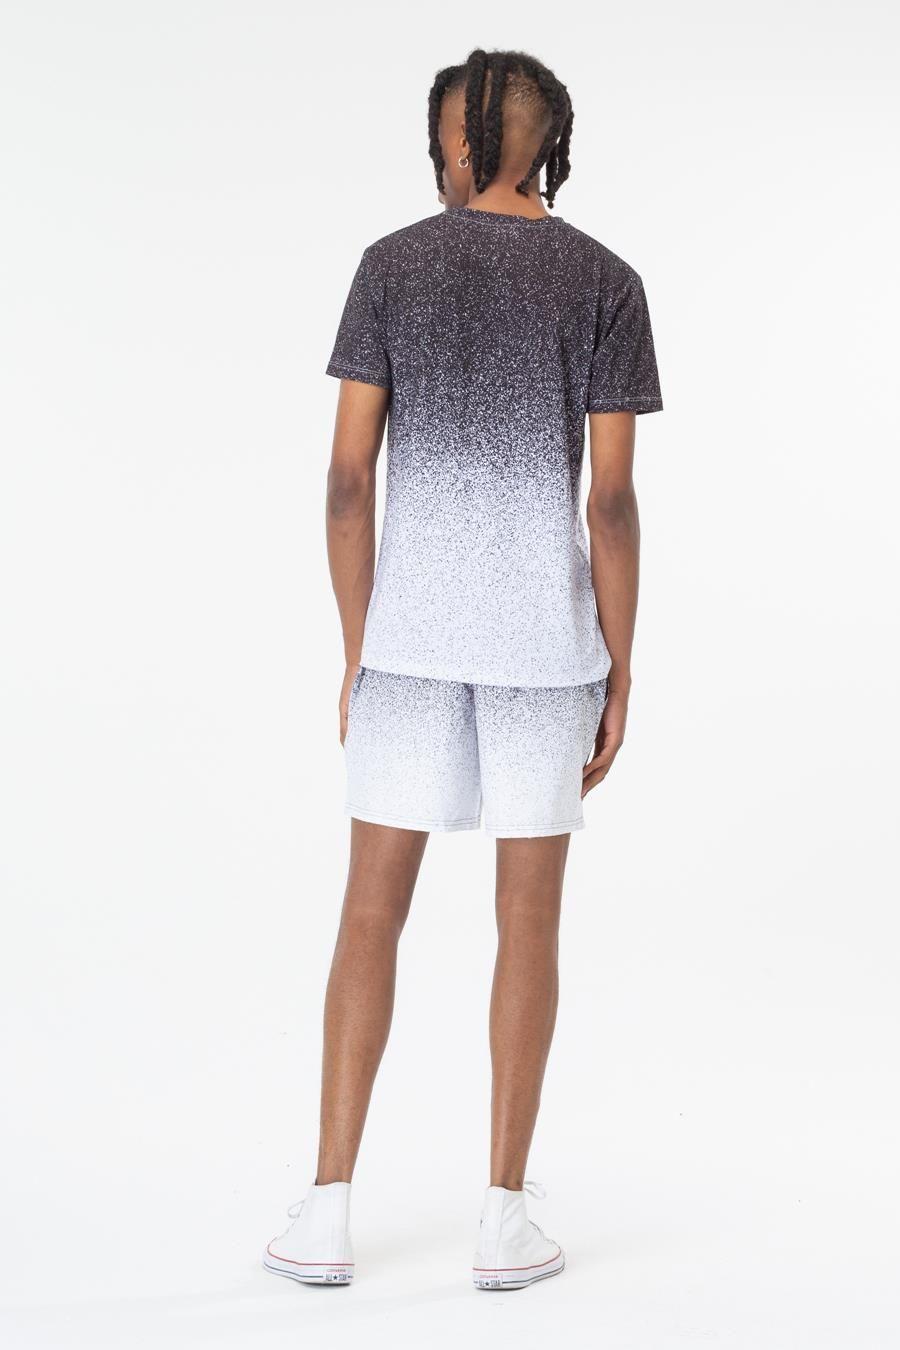 Hype Black Speckle Fade Mens T-Shirt